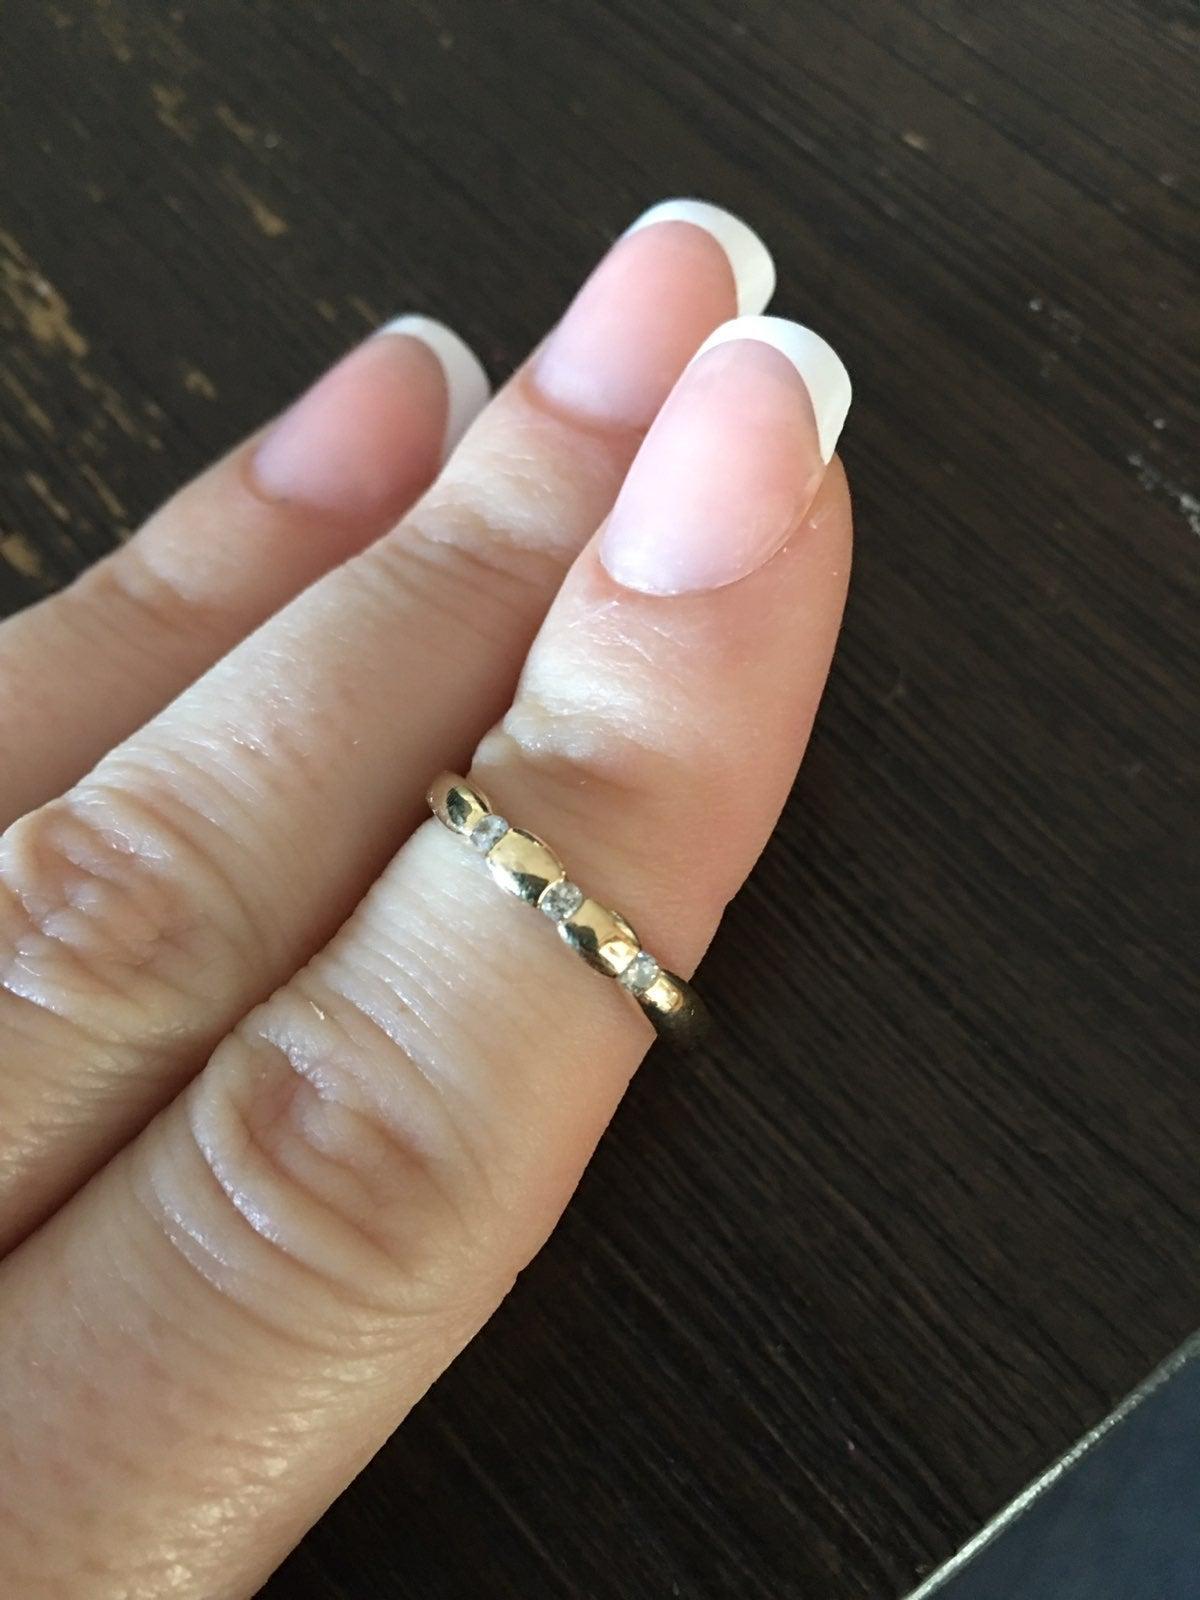 Yellow gold 3 stone ring